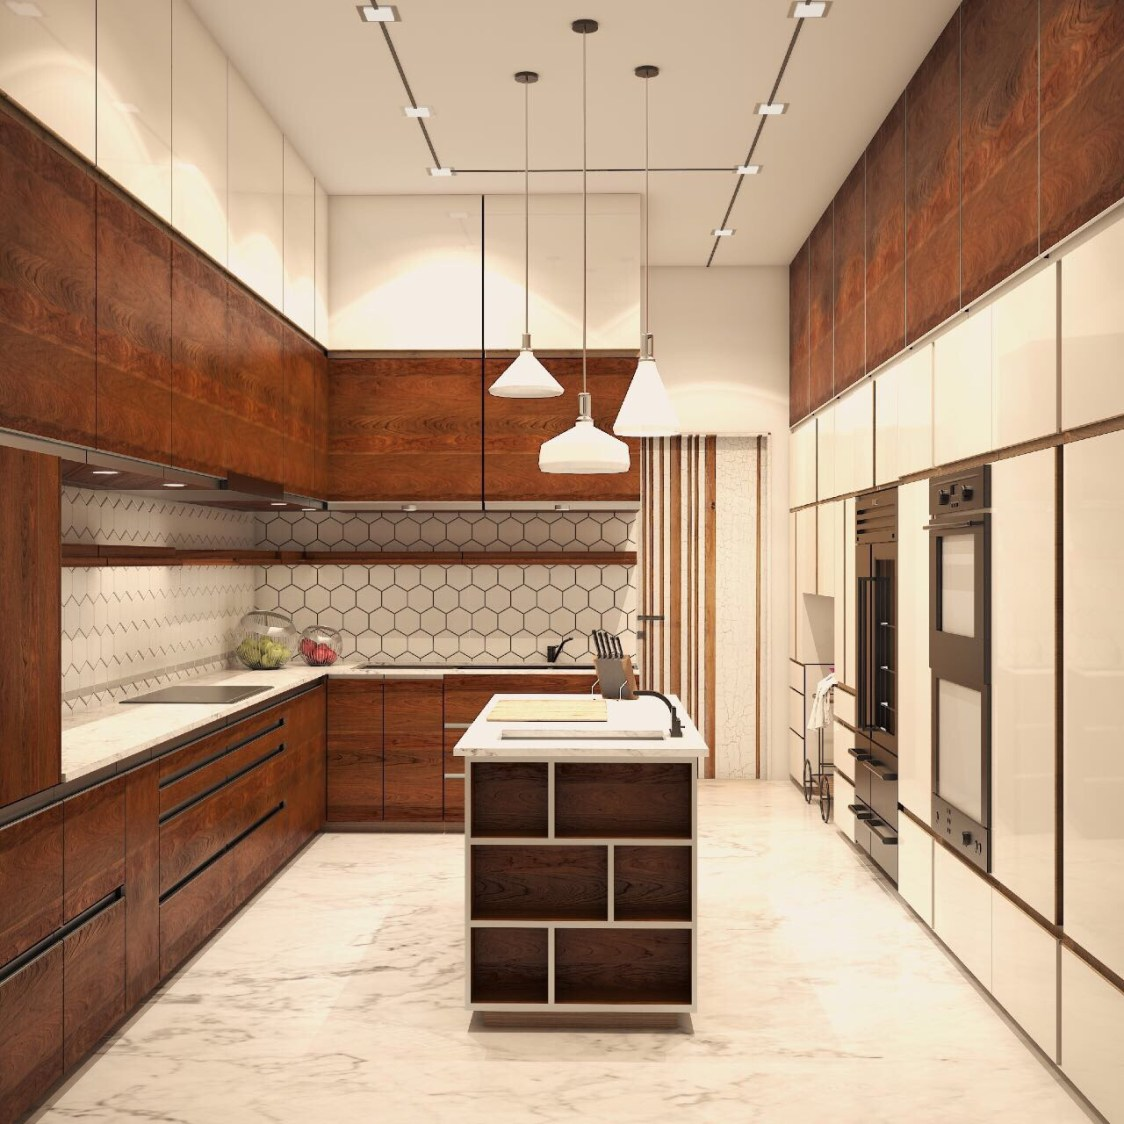 Open Island Kitchen with kitchen cabinets